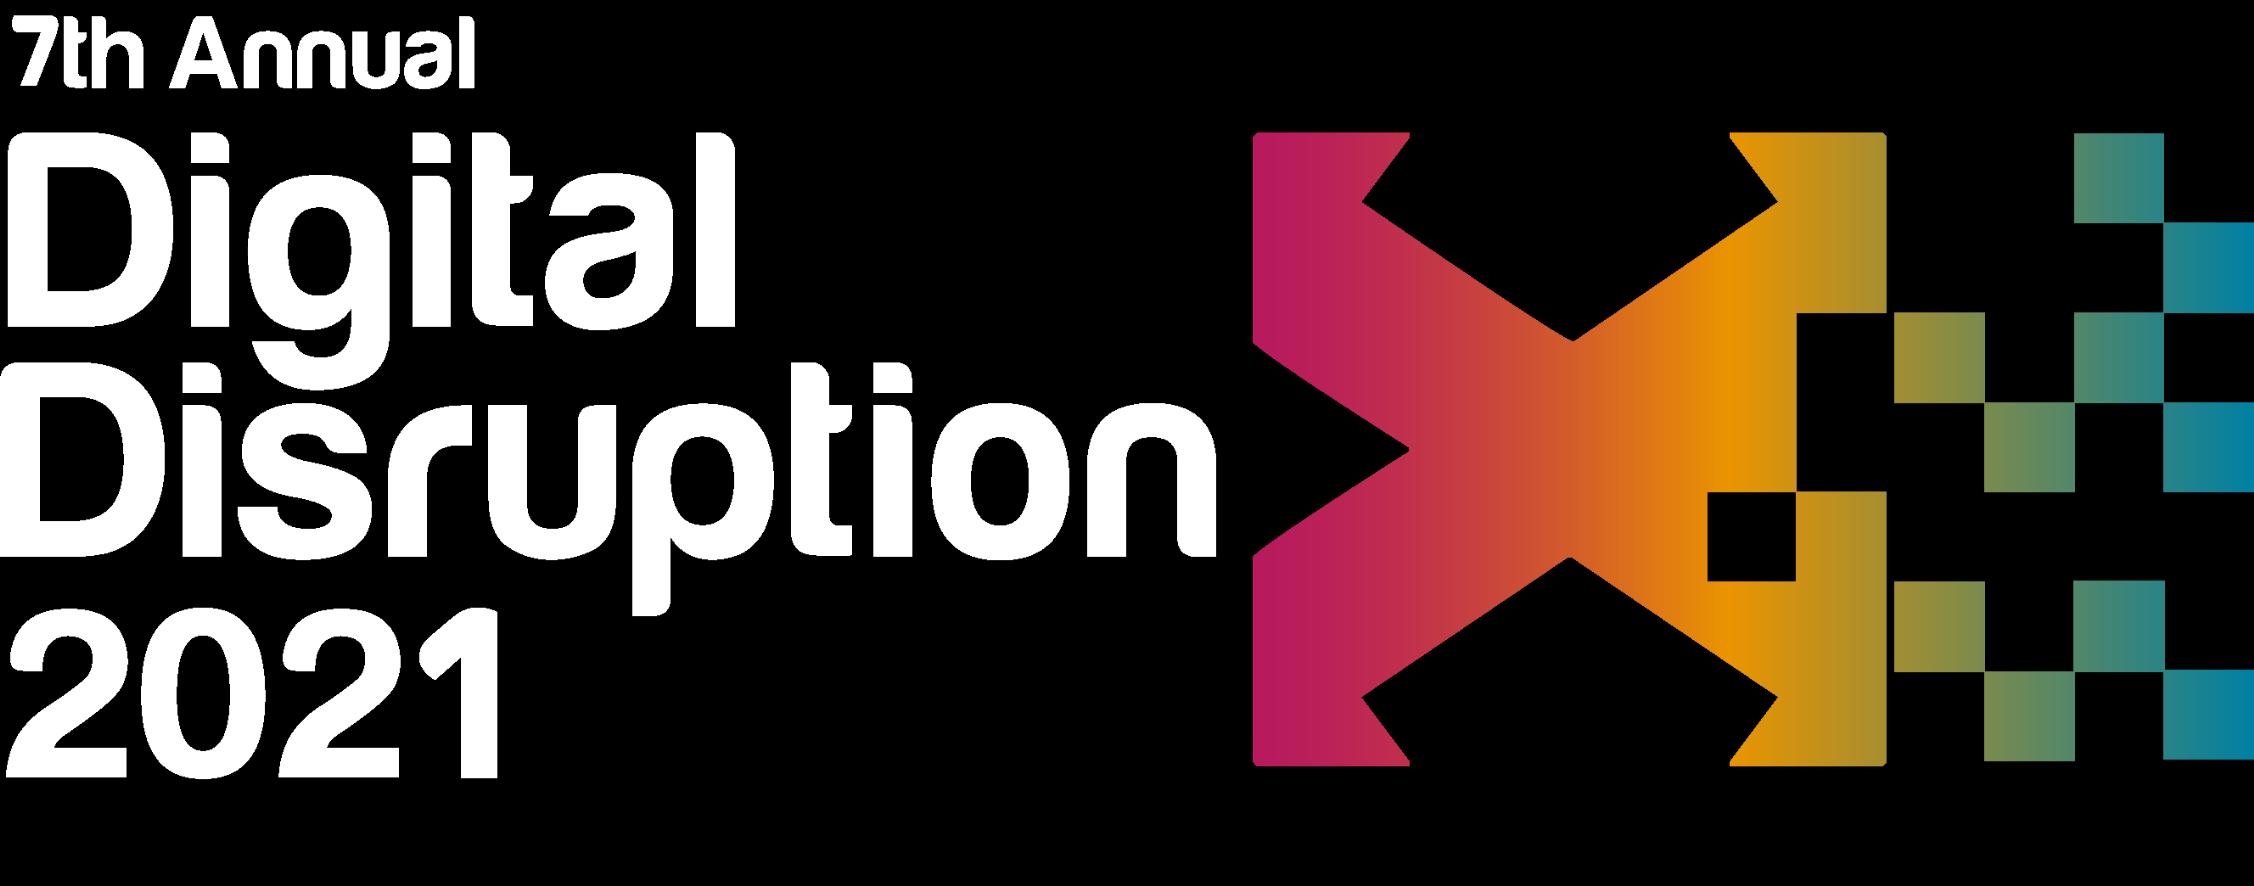 Digital Disruption 2021